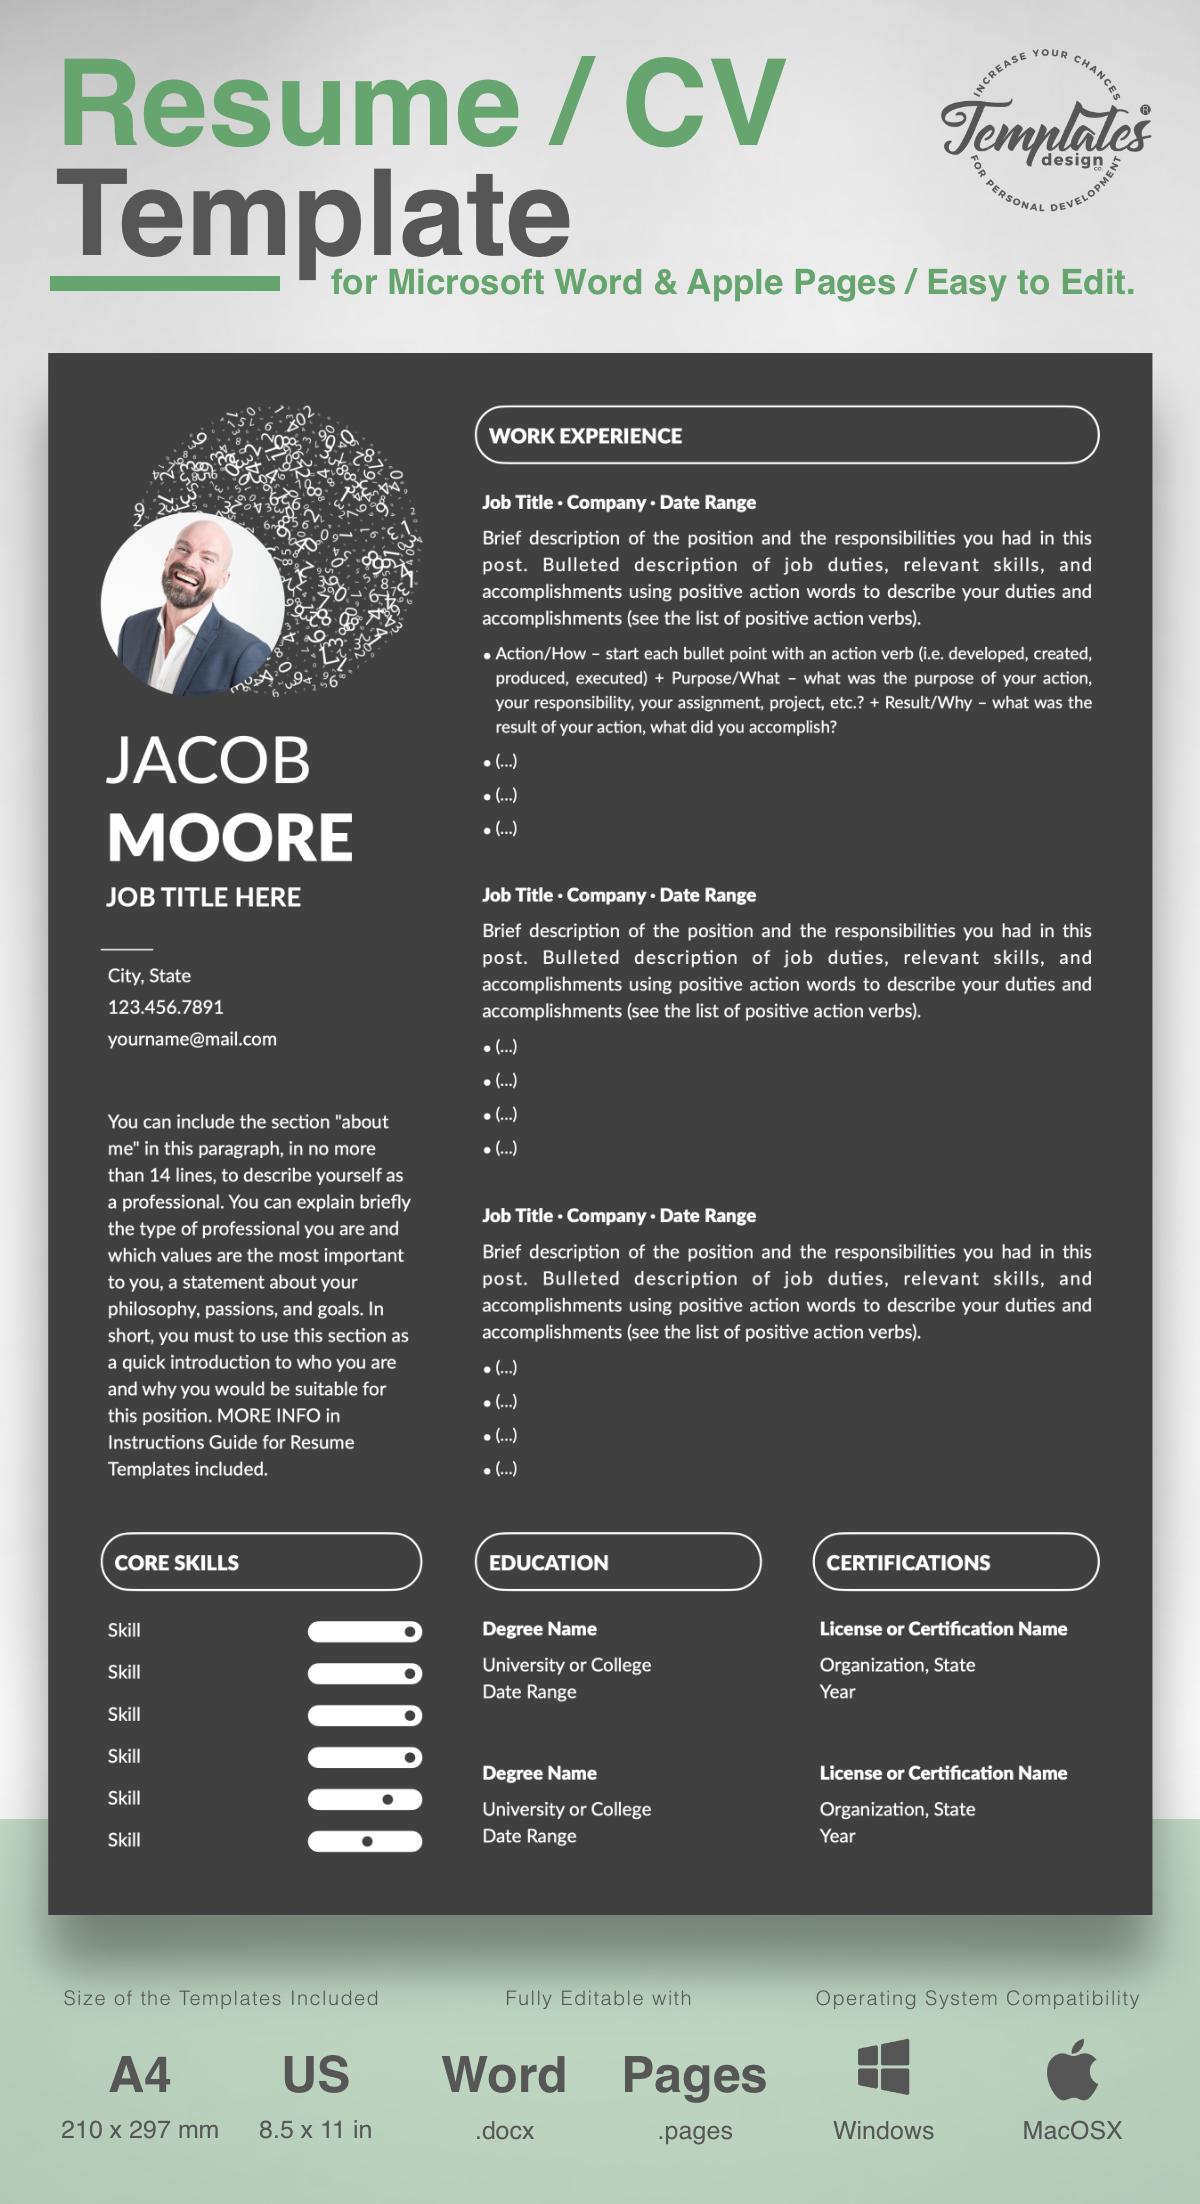 Professionelle Lebenslauf Vorlage Fur Microsoft Word Und Apple Pages Resume Templates Resume Downloadable Resume Template